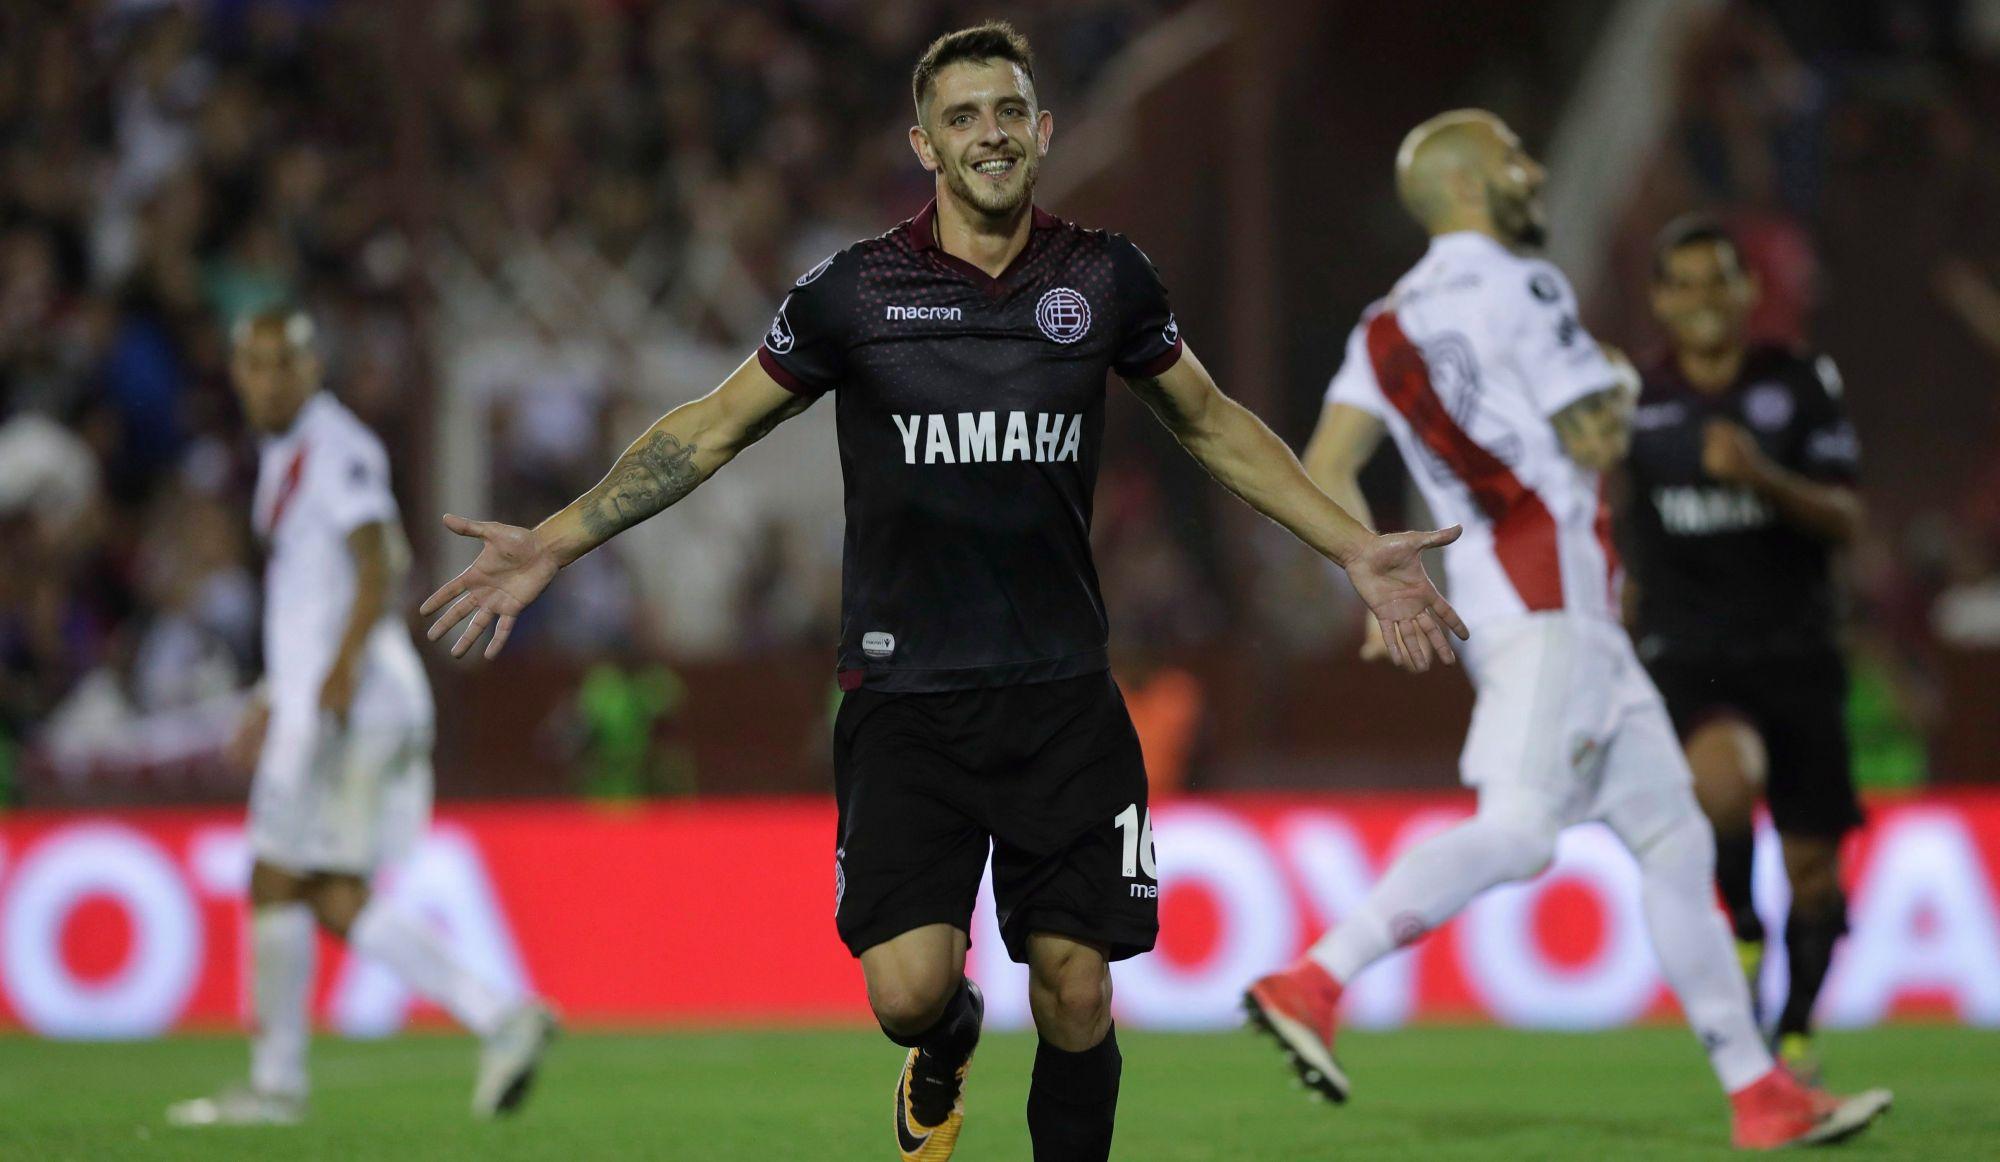 «(Silva) est un joueur offensif qui va améliorer notre attaque» - Garde